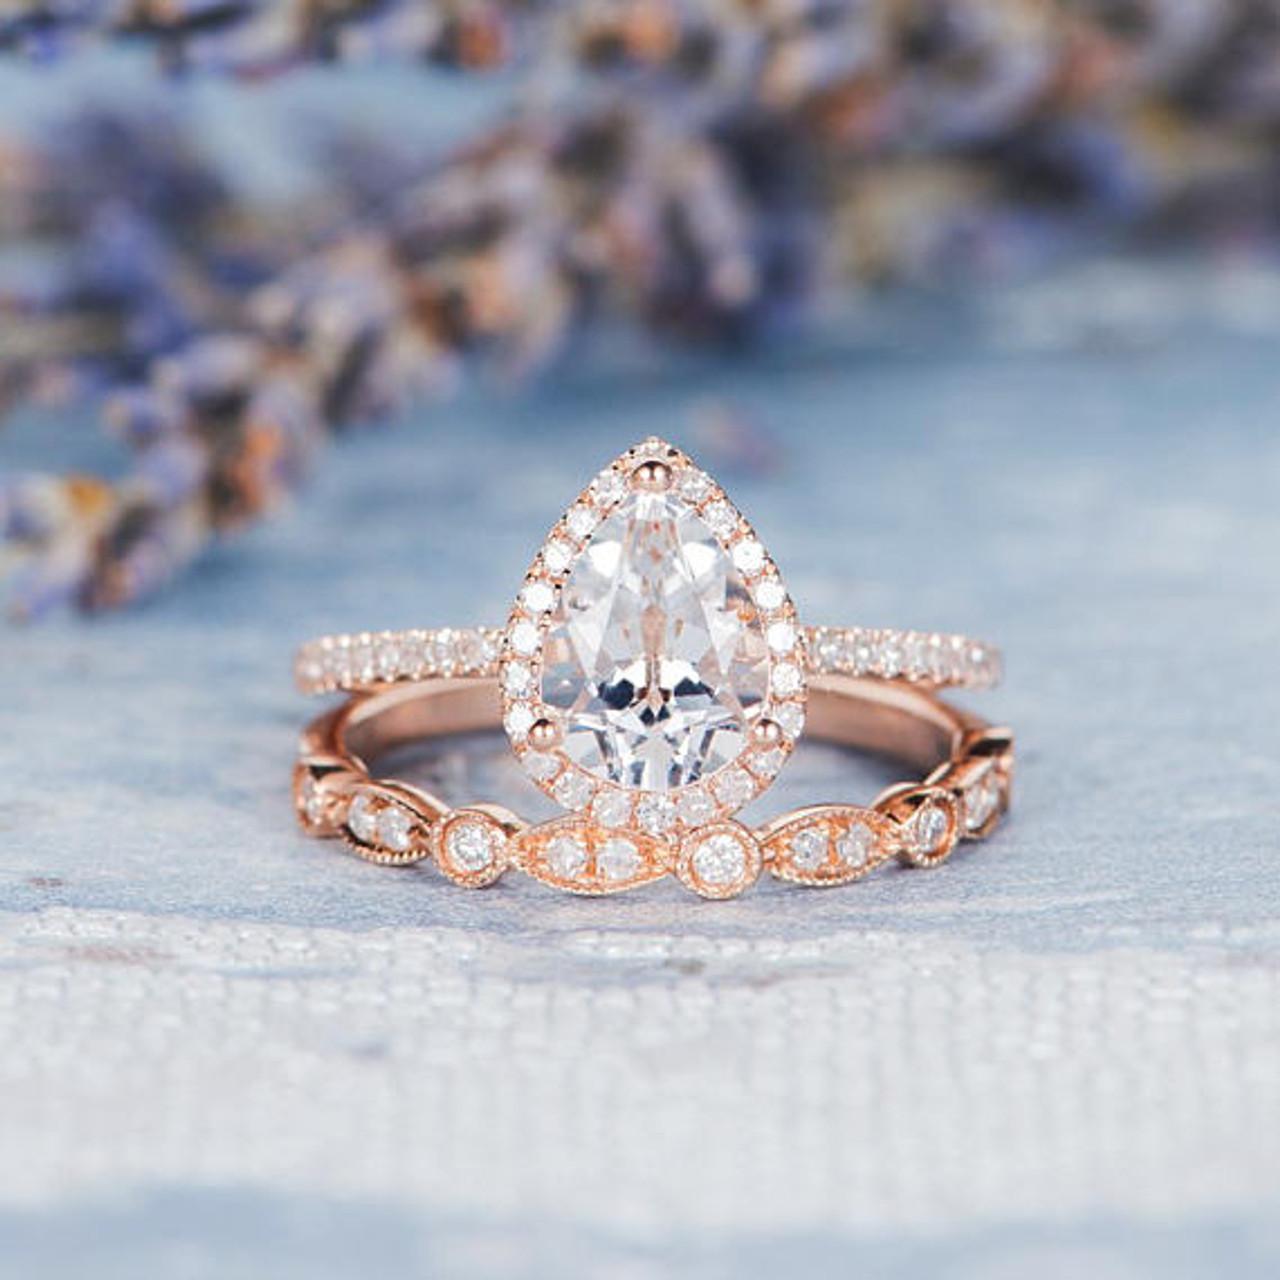 Ladies 14K Rose Gold Over Oval Diamond Engagement Ring Wedding Bridal Set